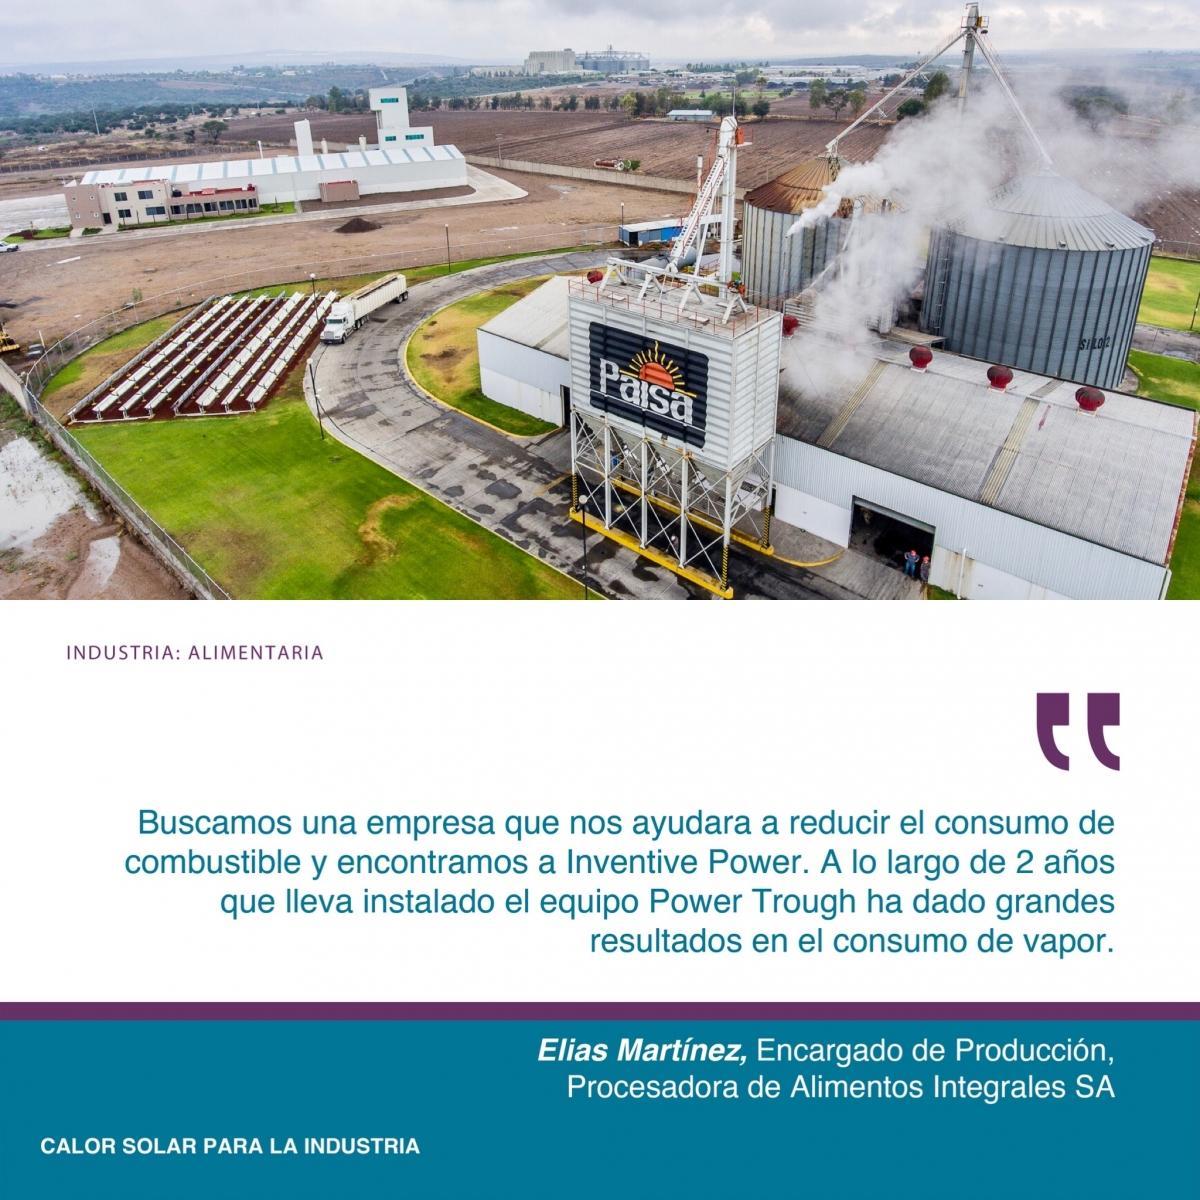 SPB México Testimonio Procesadora de Alimentos Integrales Inventive Power